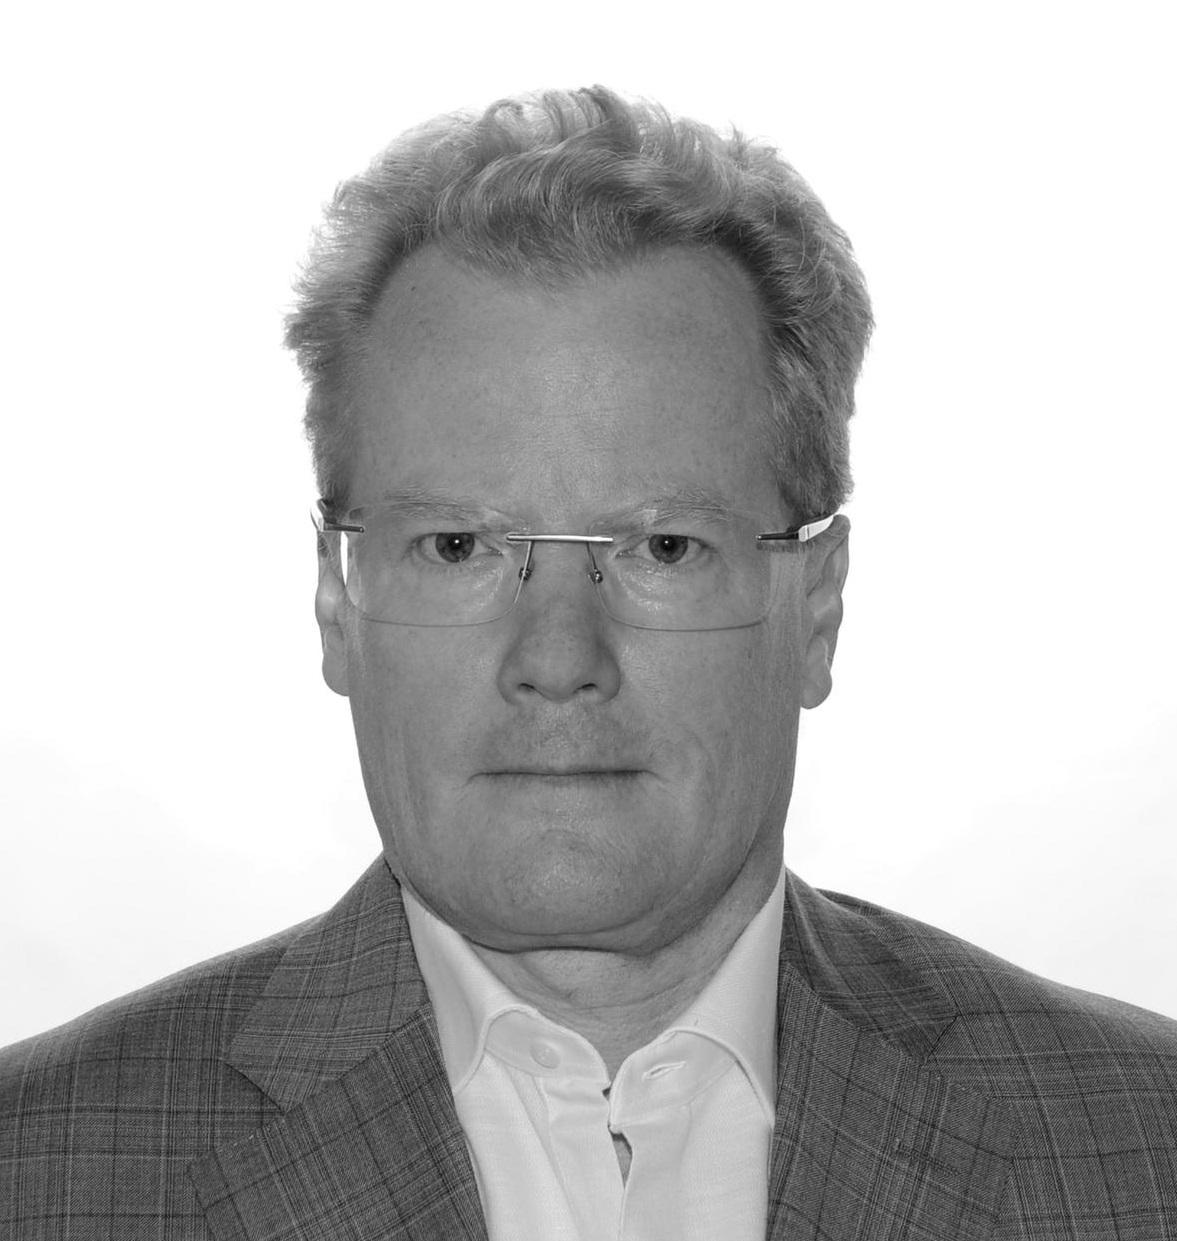 Alexandre Vassiltchikov